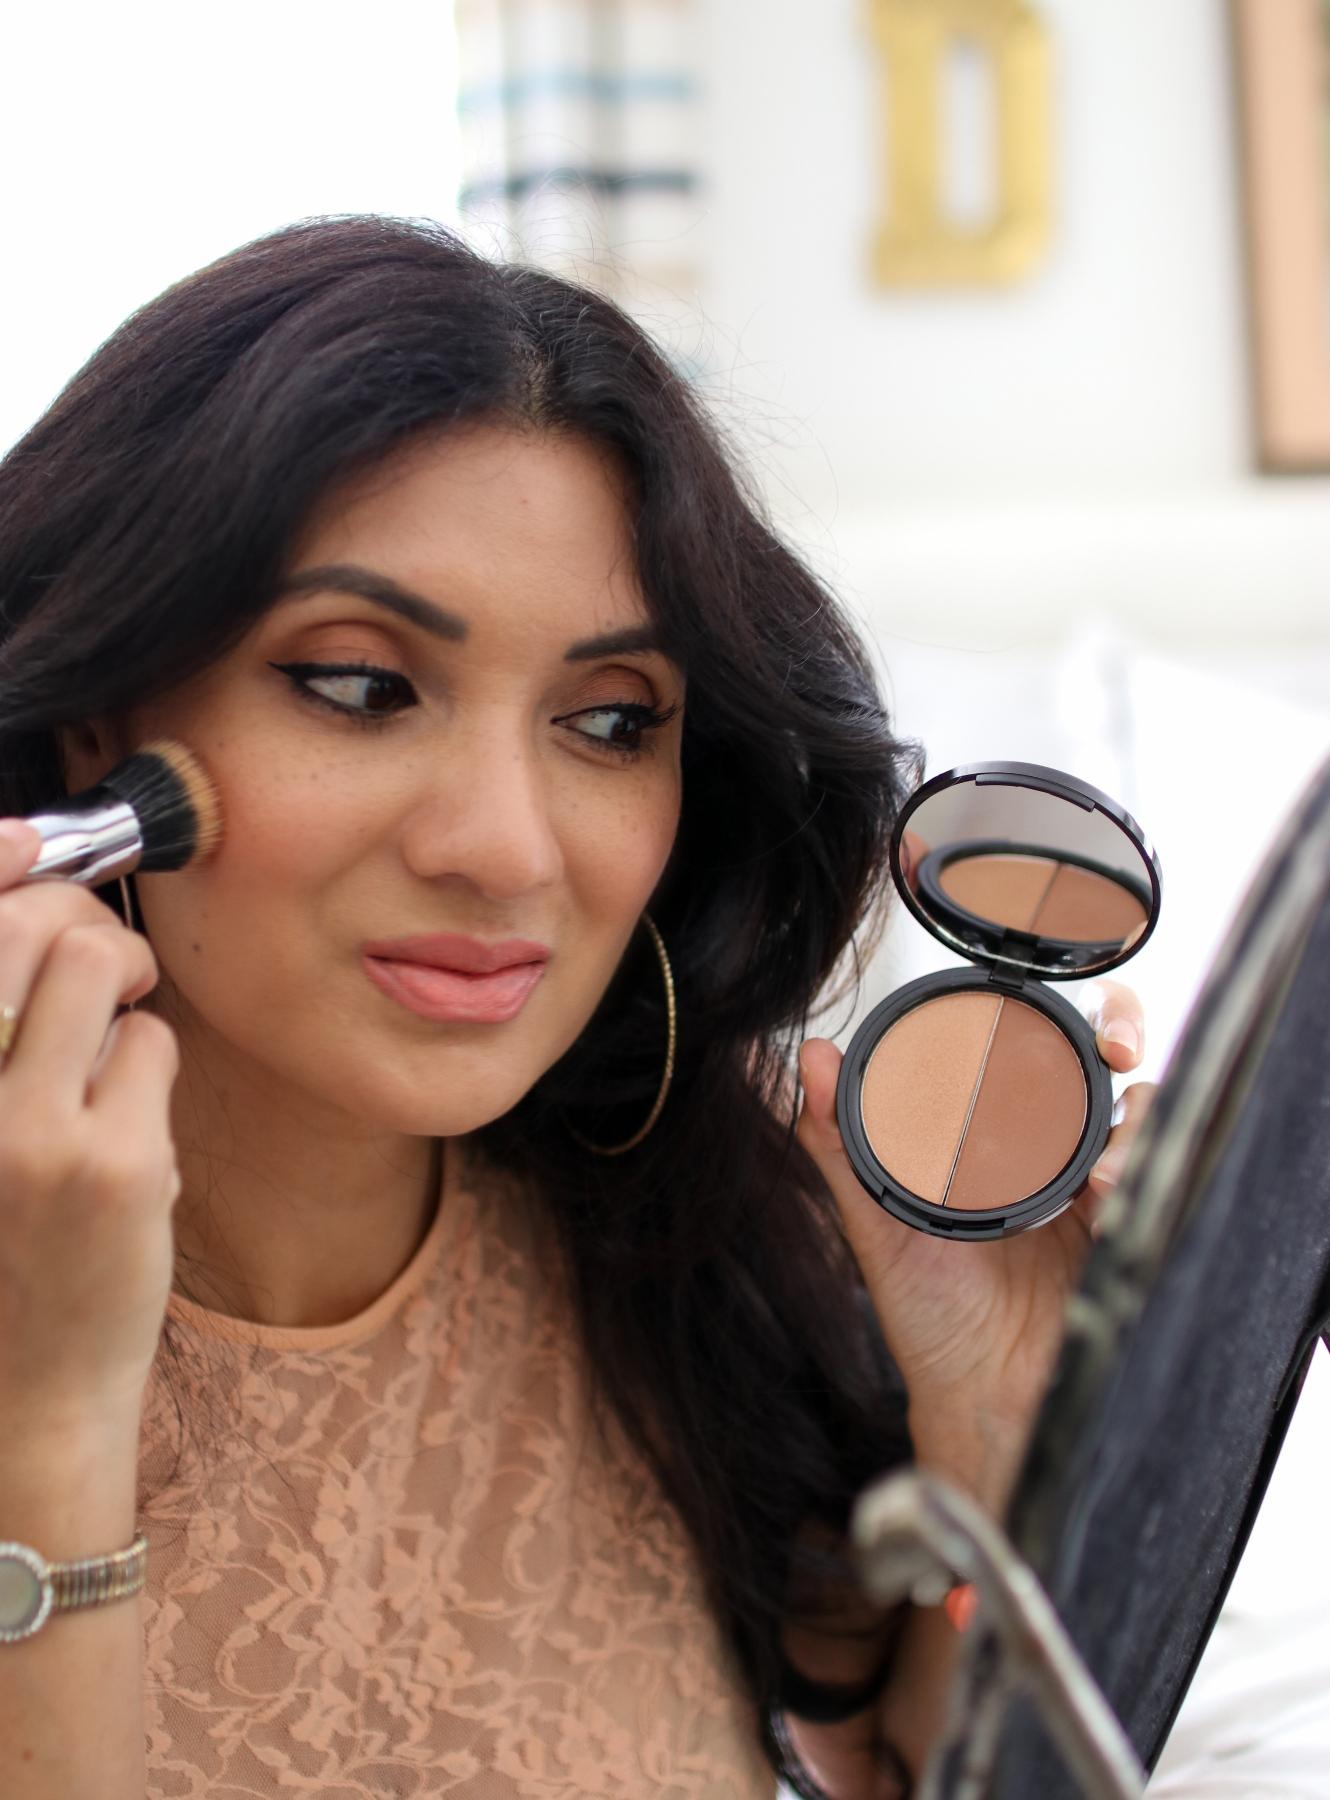 LONG WEAR POWDER SPLIT PAN DUO - Manna Kadara Cosmetics - Debbie Savage